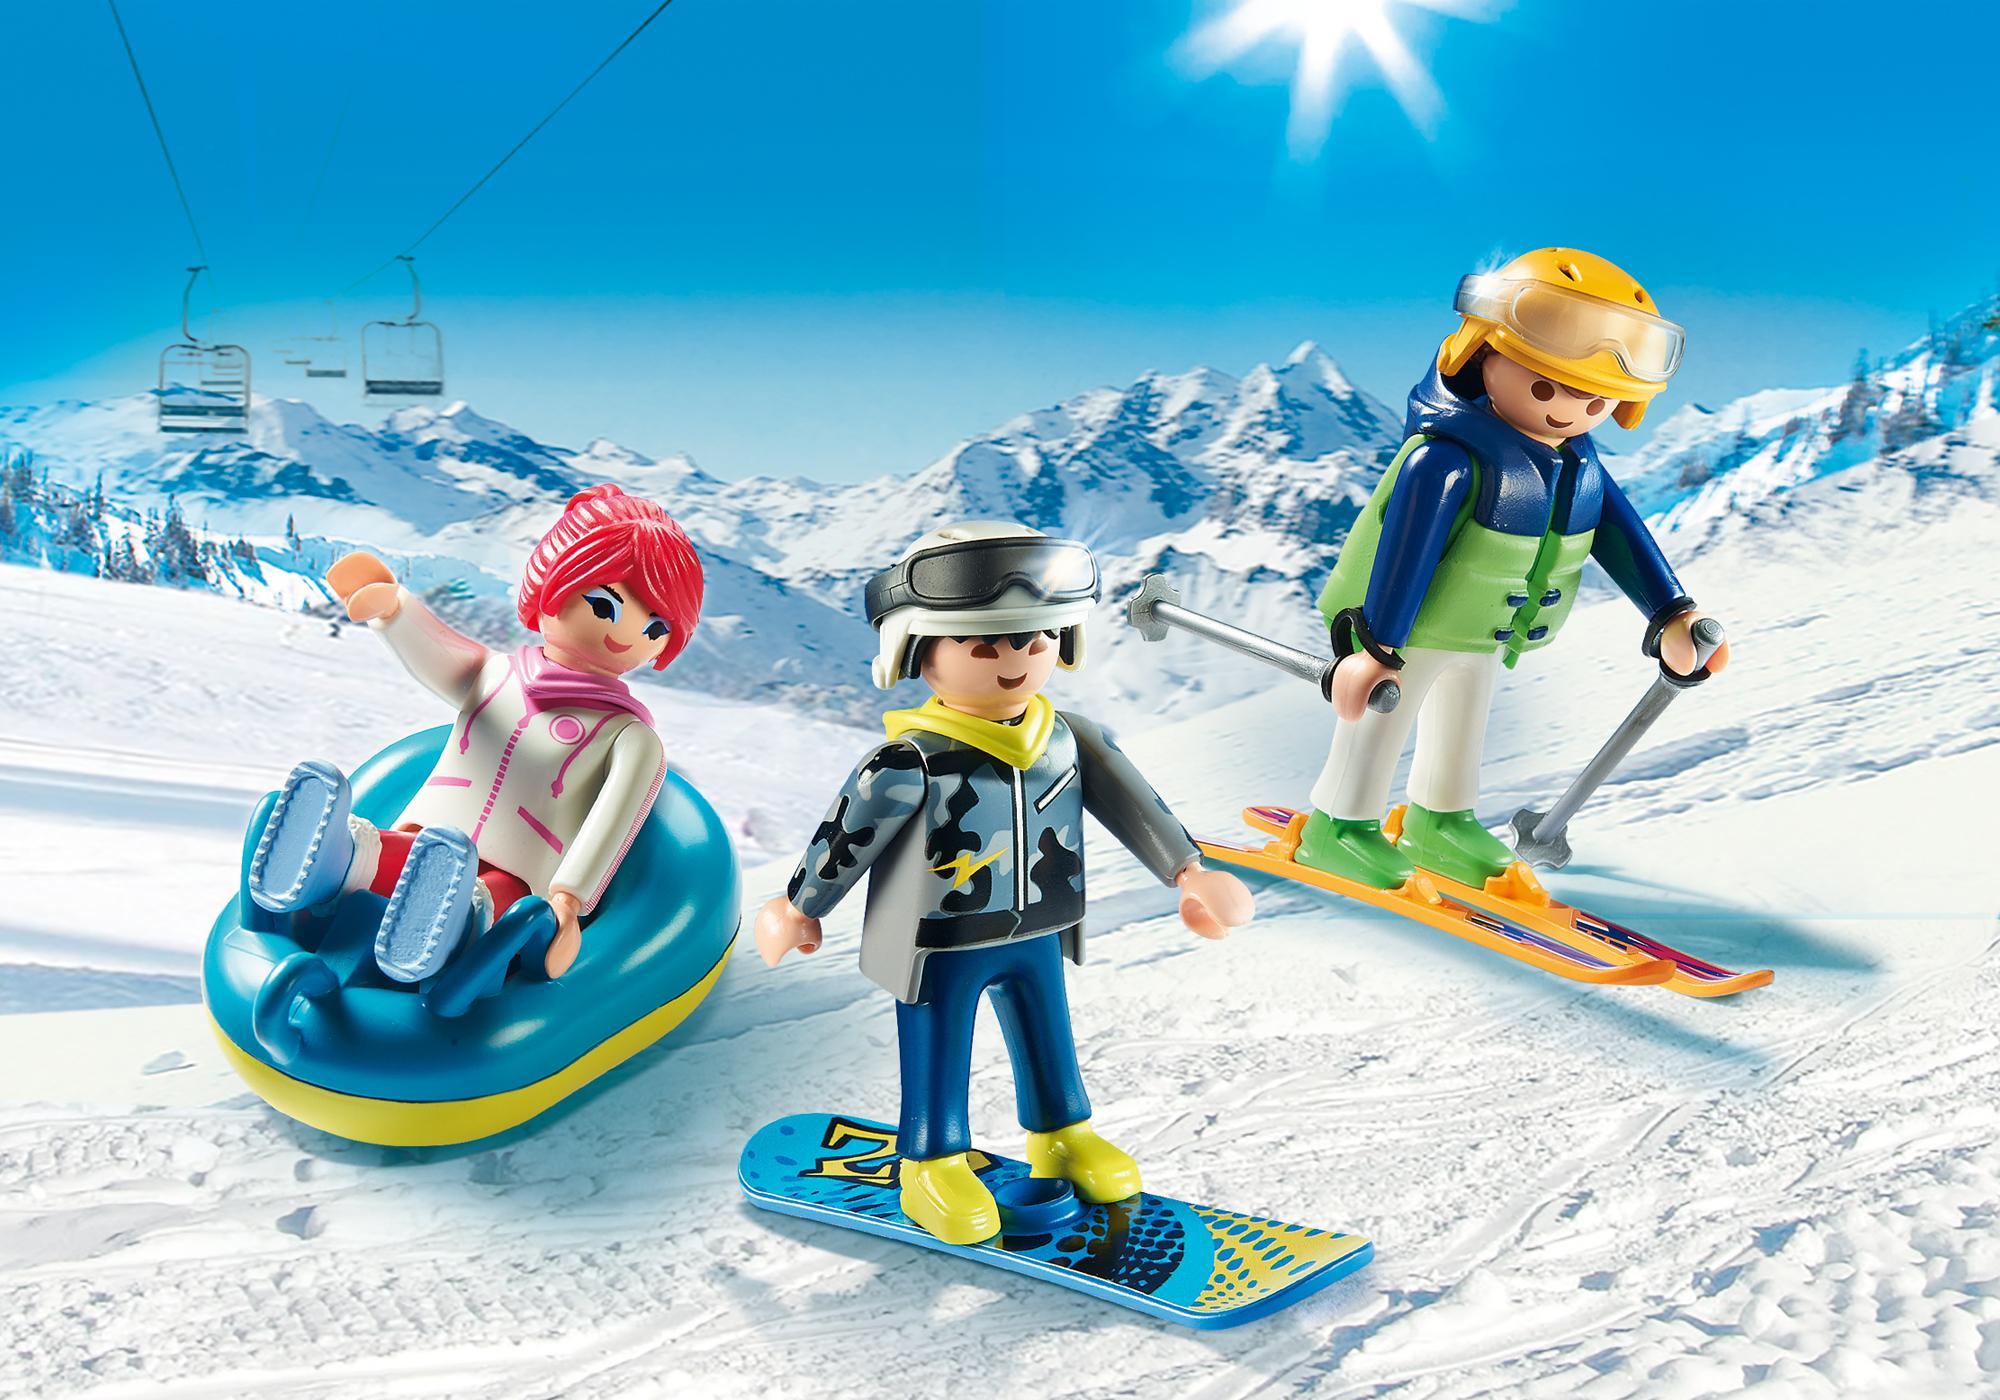 http://media.playmobil.com/i/playmobil/9286_product_detail/Vacanciers aux sports d'hiver